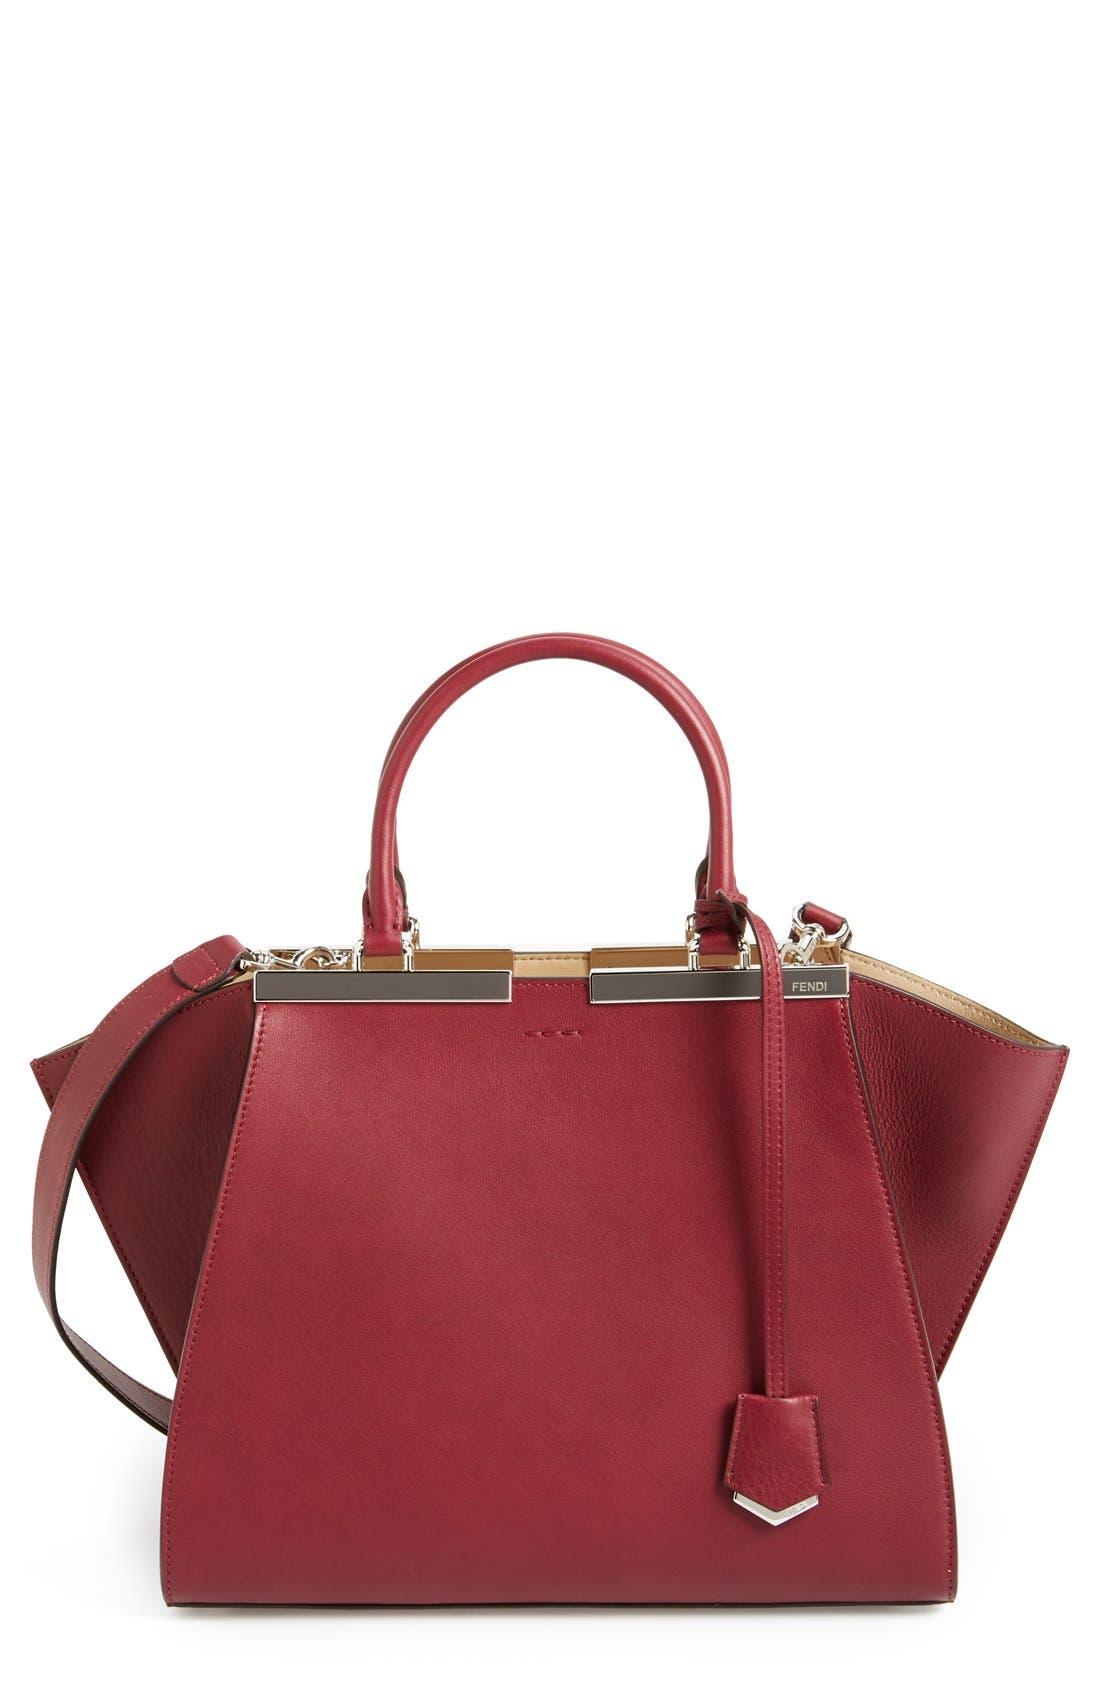 Main Image - Fendi 'Petit 3Jours' Leather Shopper